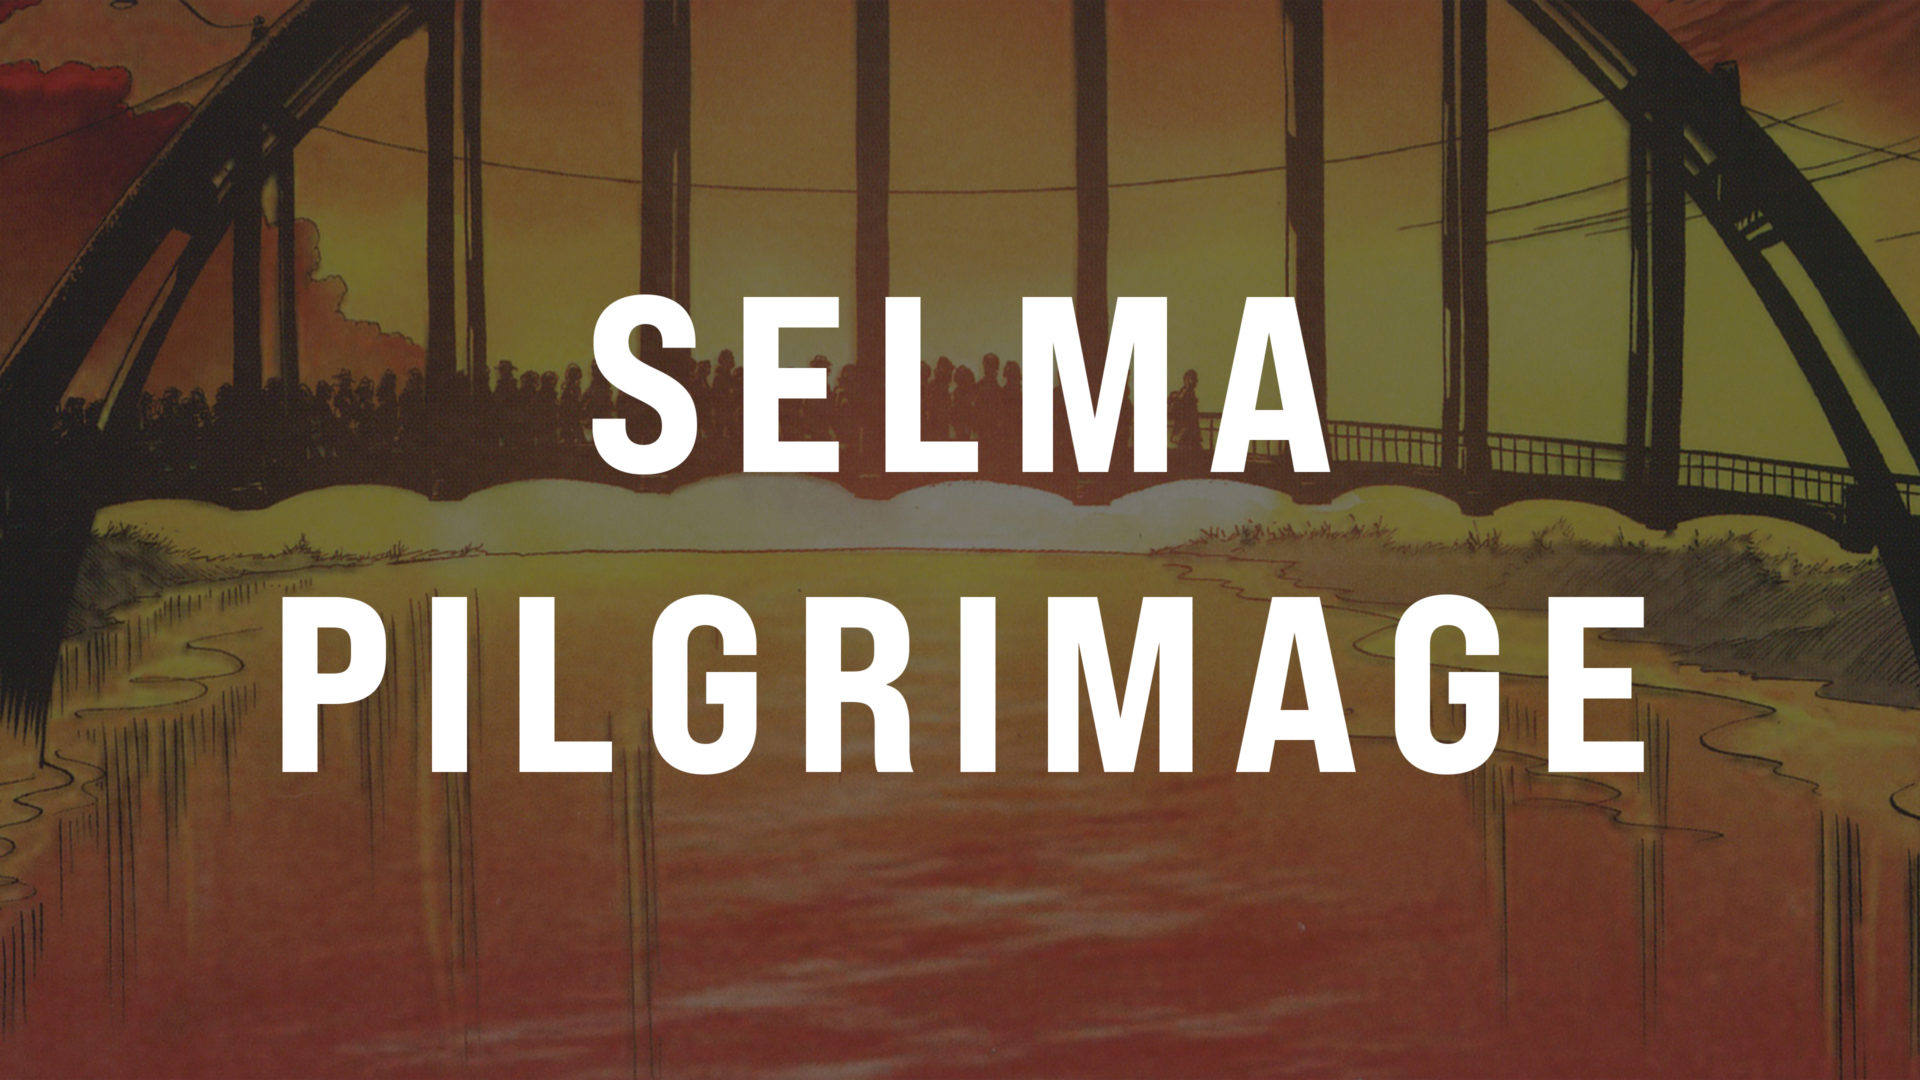 Selma Banner Image